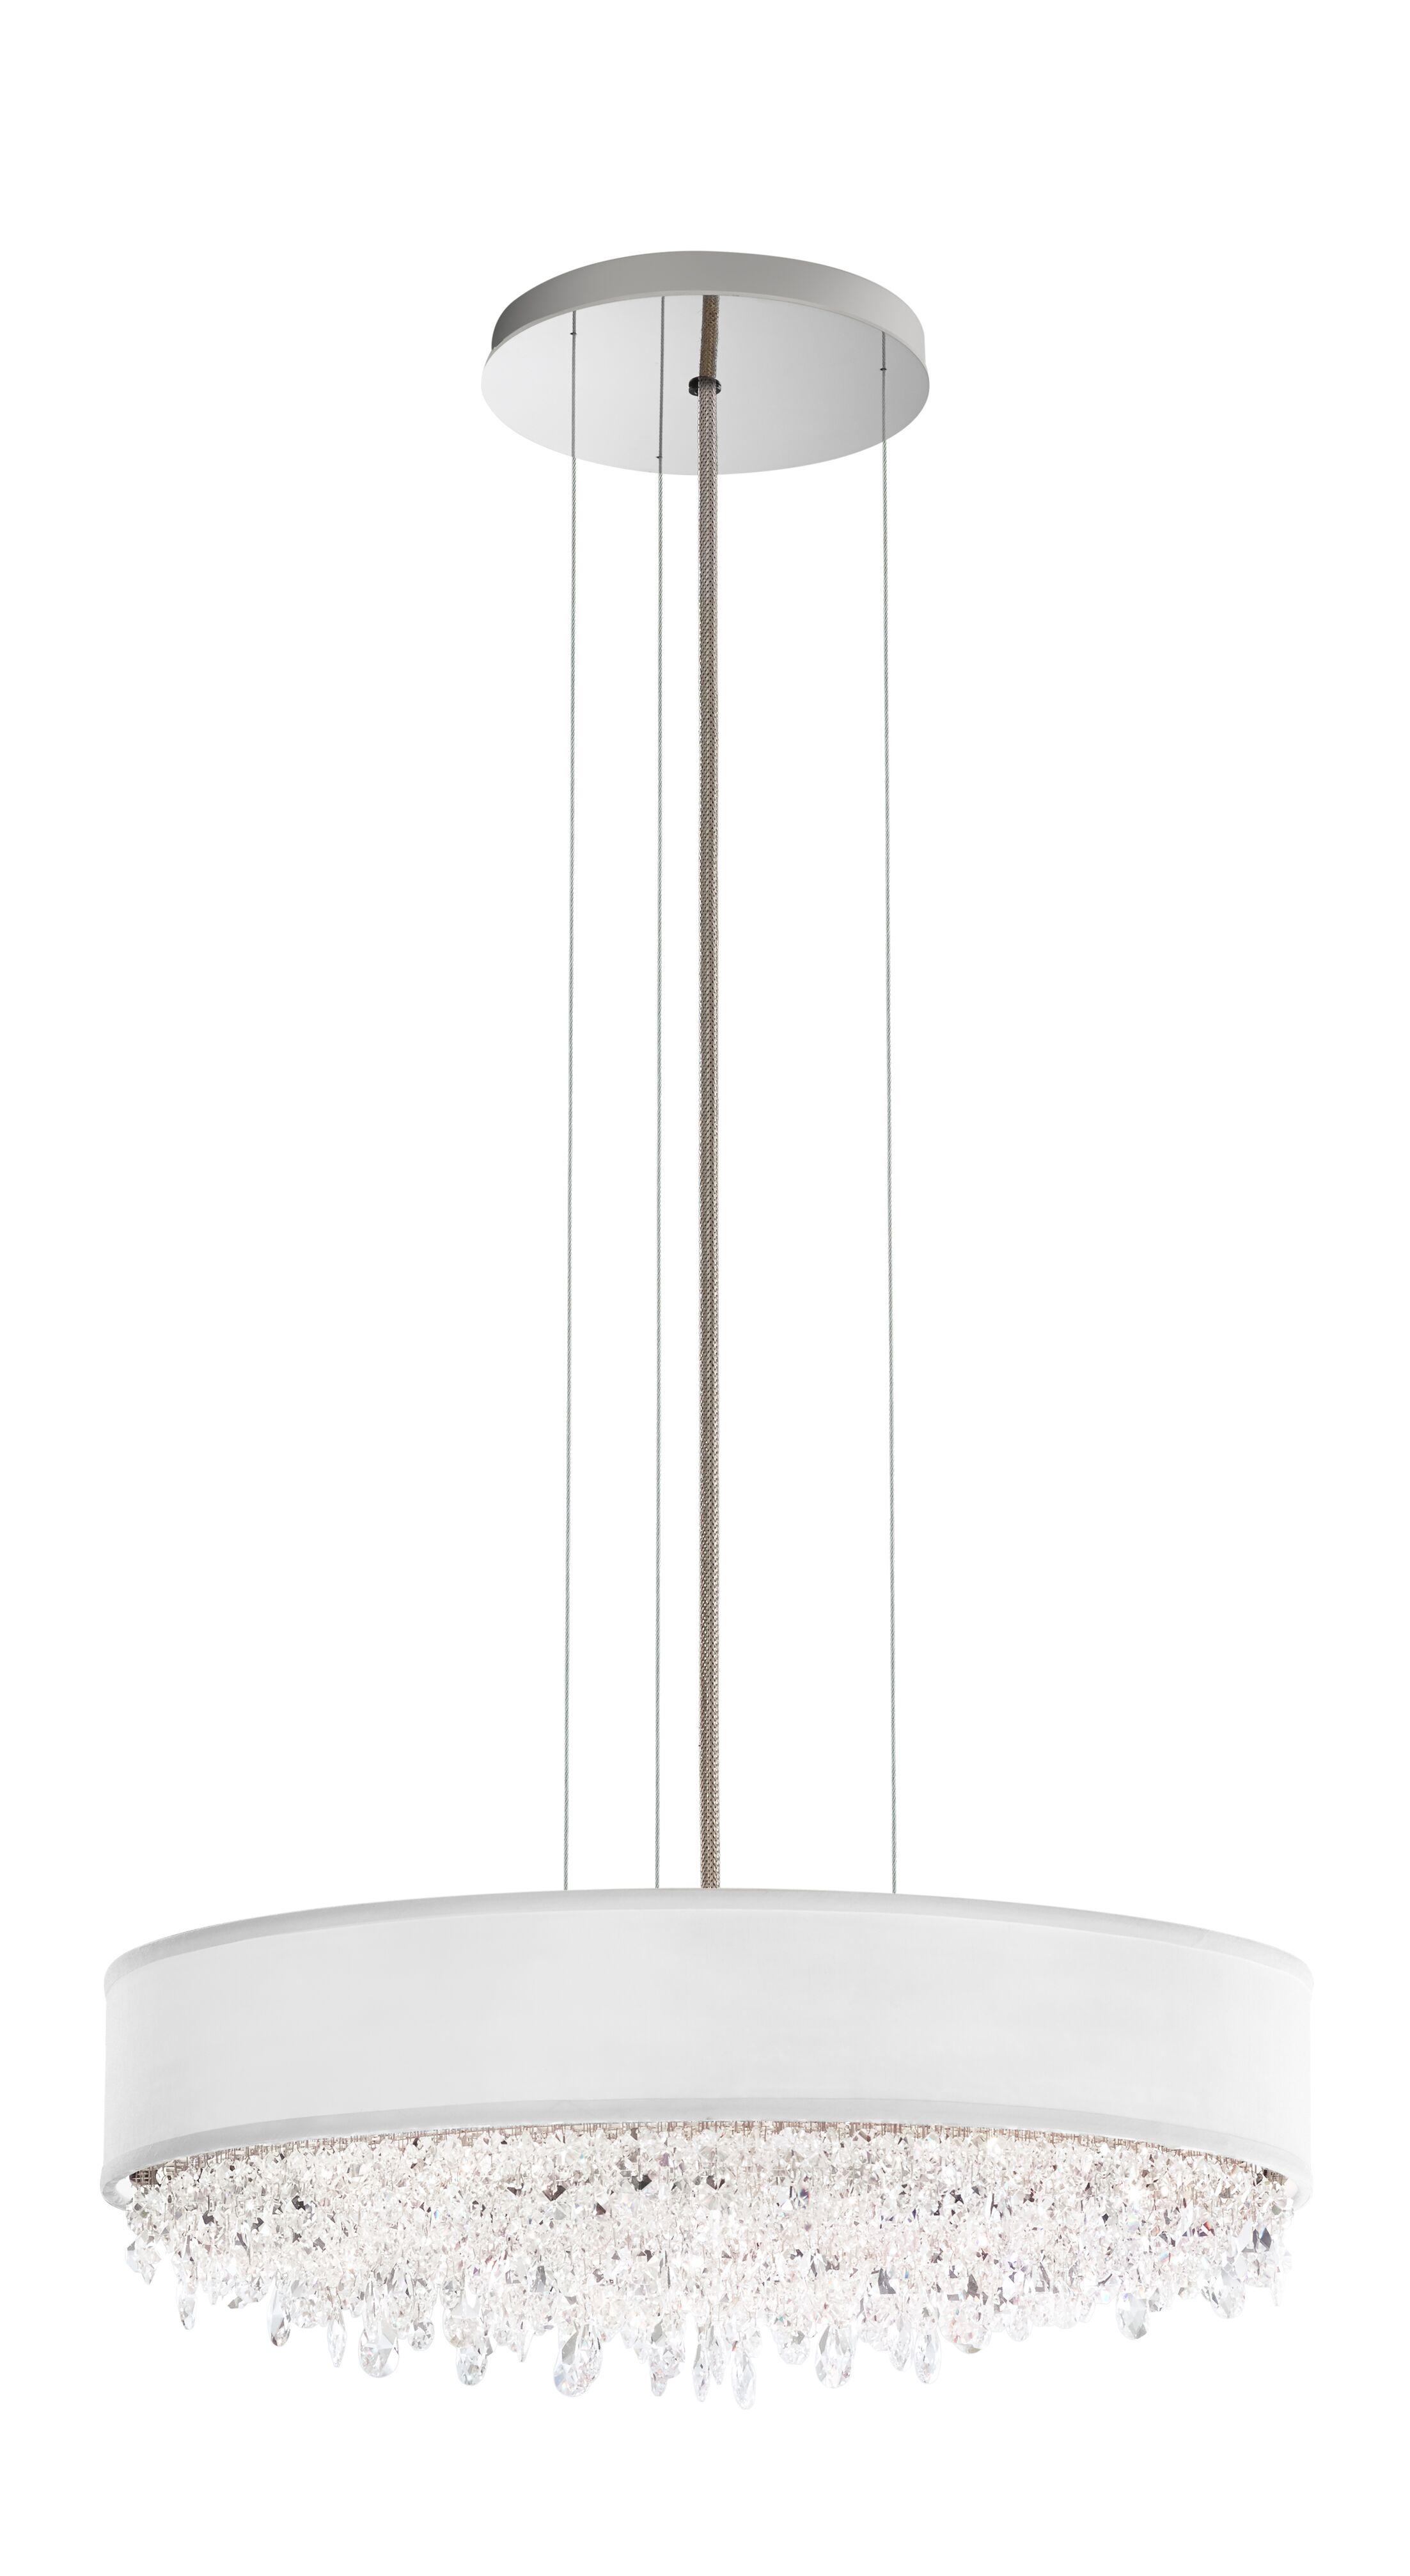 Eclyptix Crystal Chandelier Crystal: Swarovski, Shade Color: White, Size: 6.5